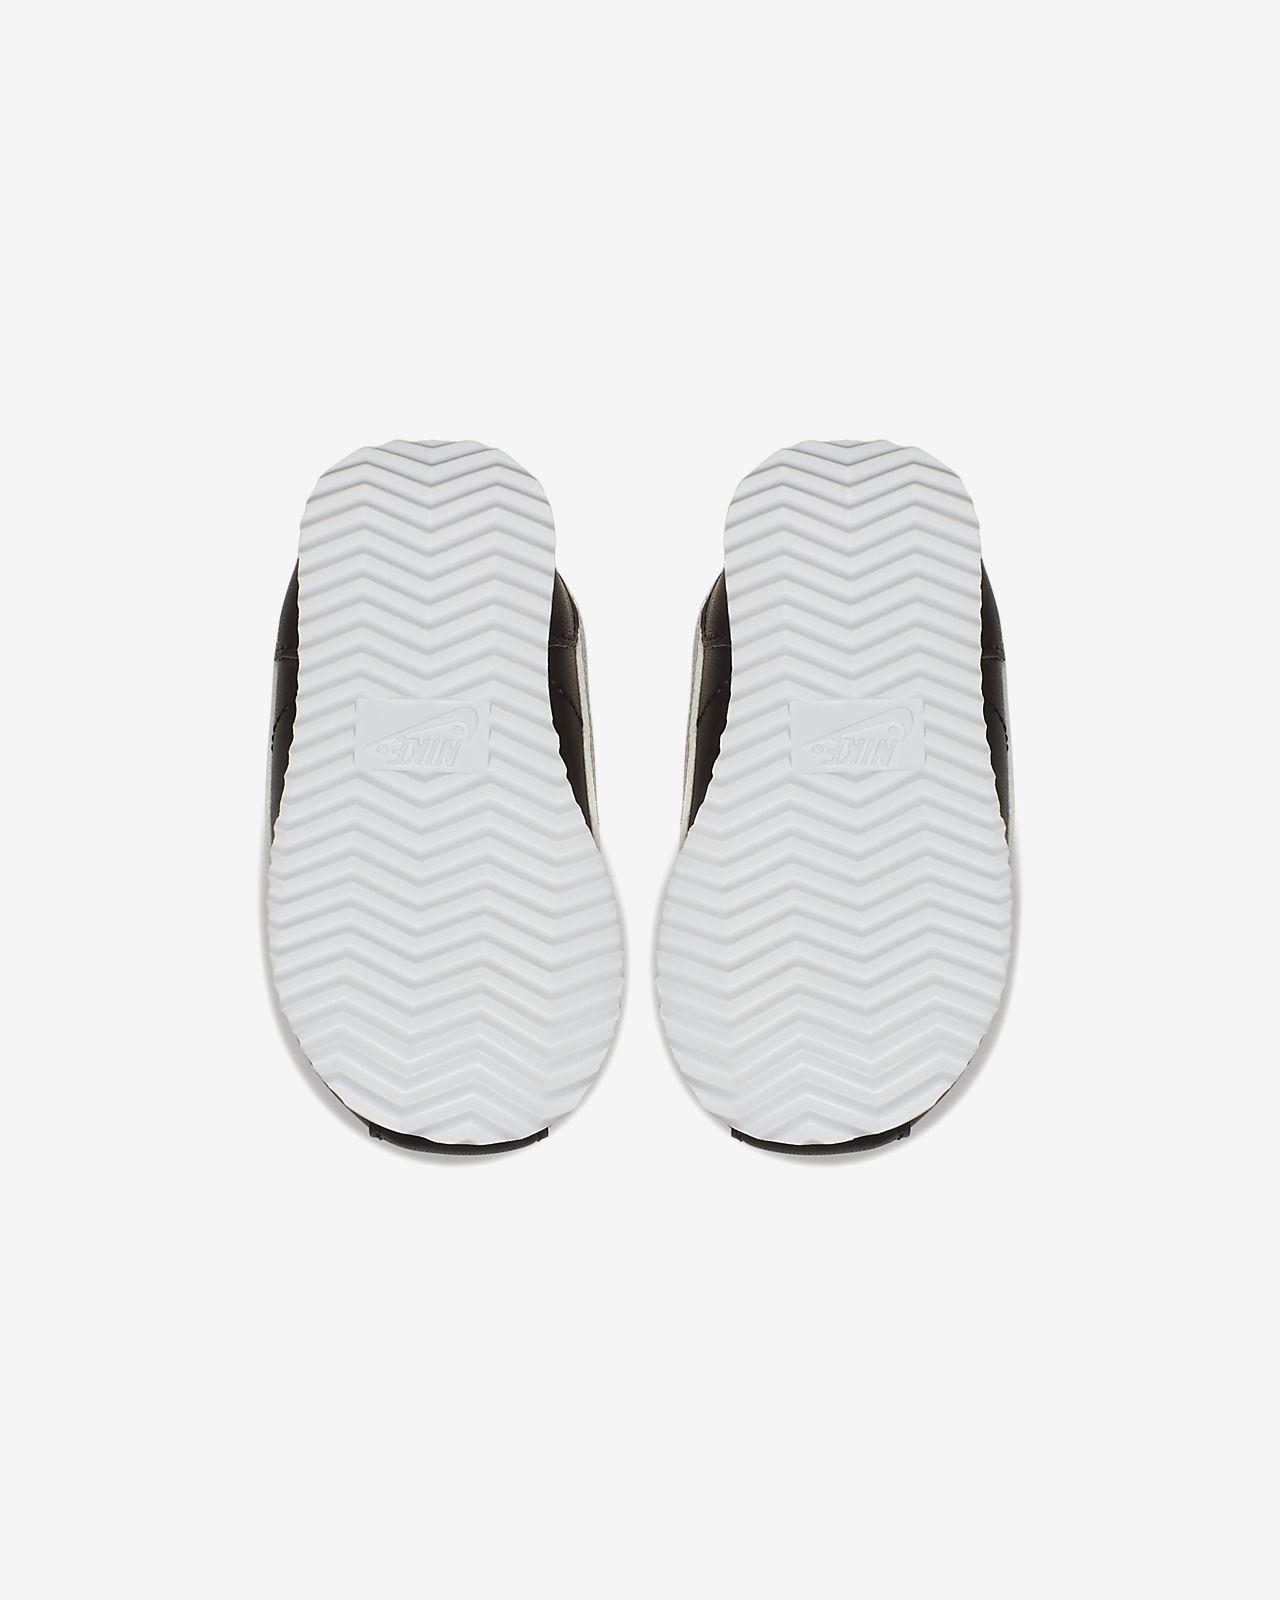 61a3dffd8 Nike Cortez Basic SL Infant Toddler Shoe. Nike.com